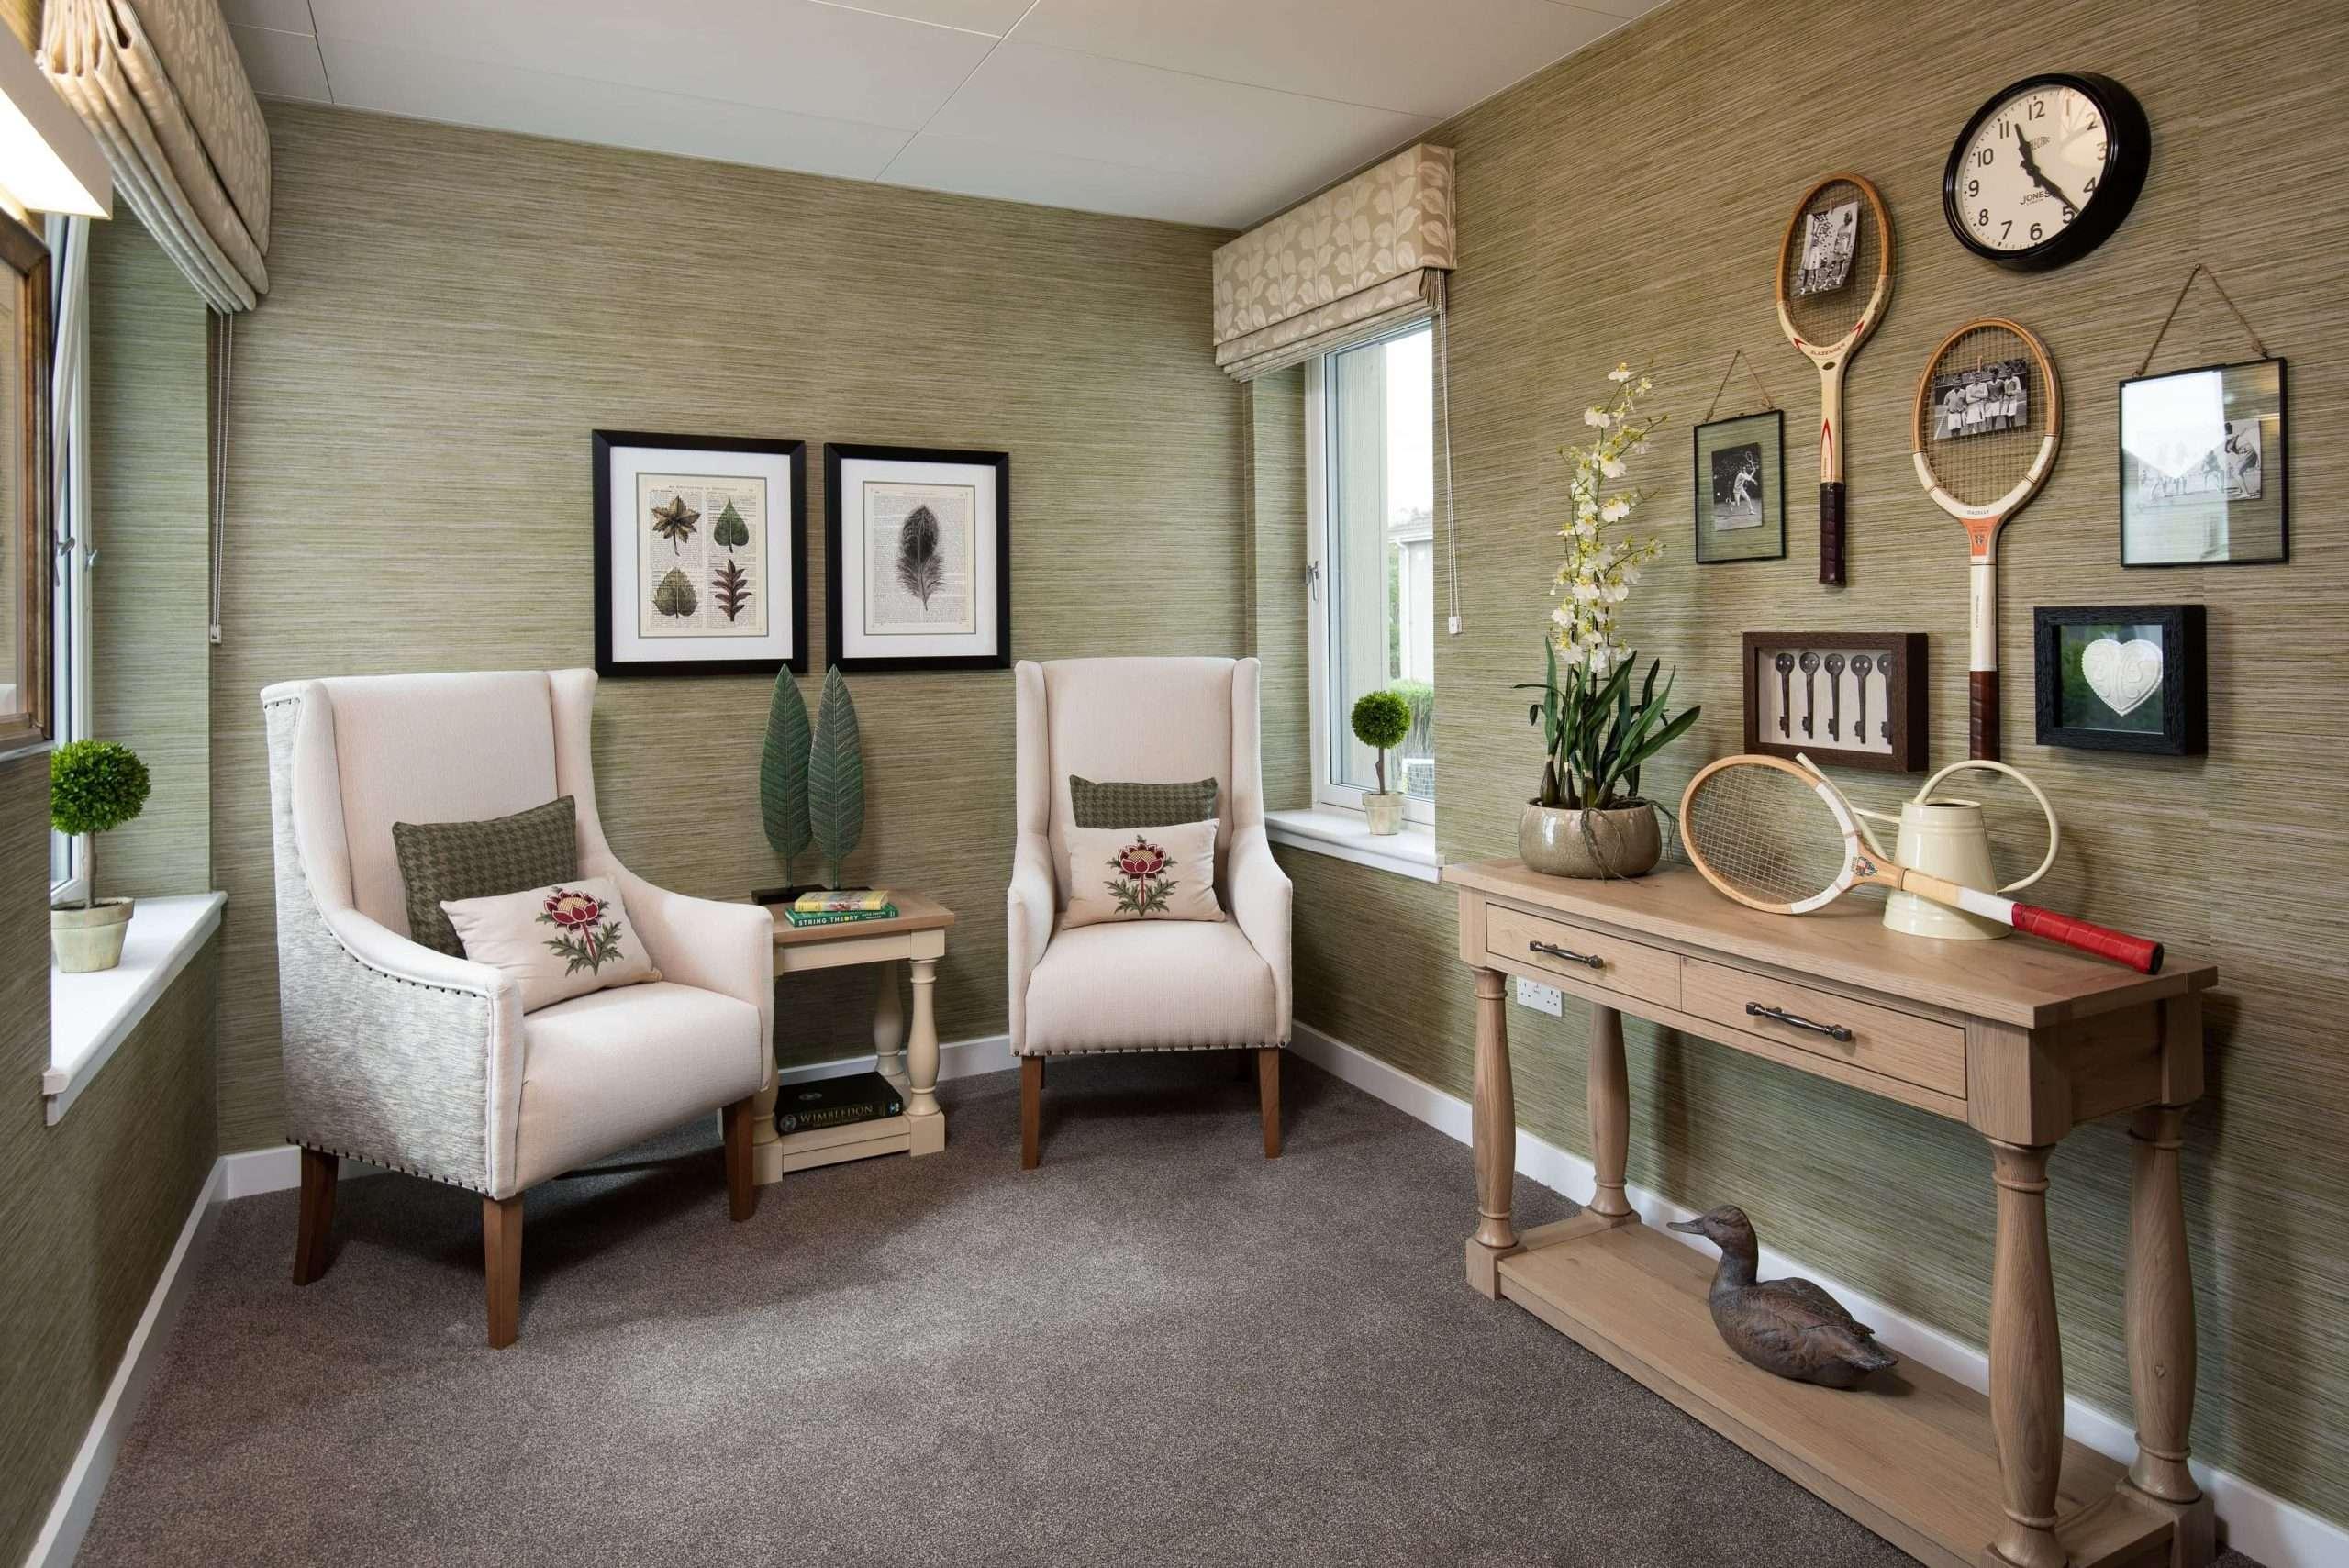 Snug seating area with Cluny interior design